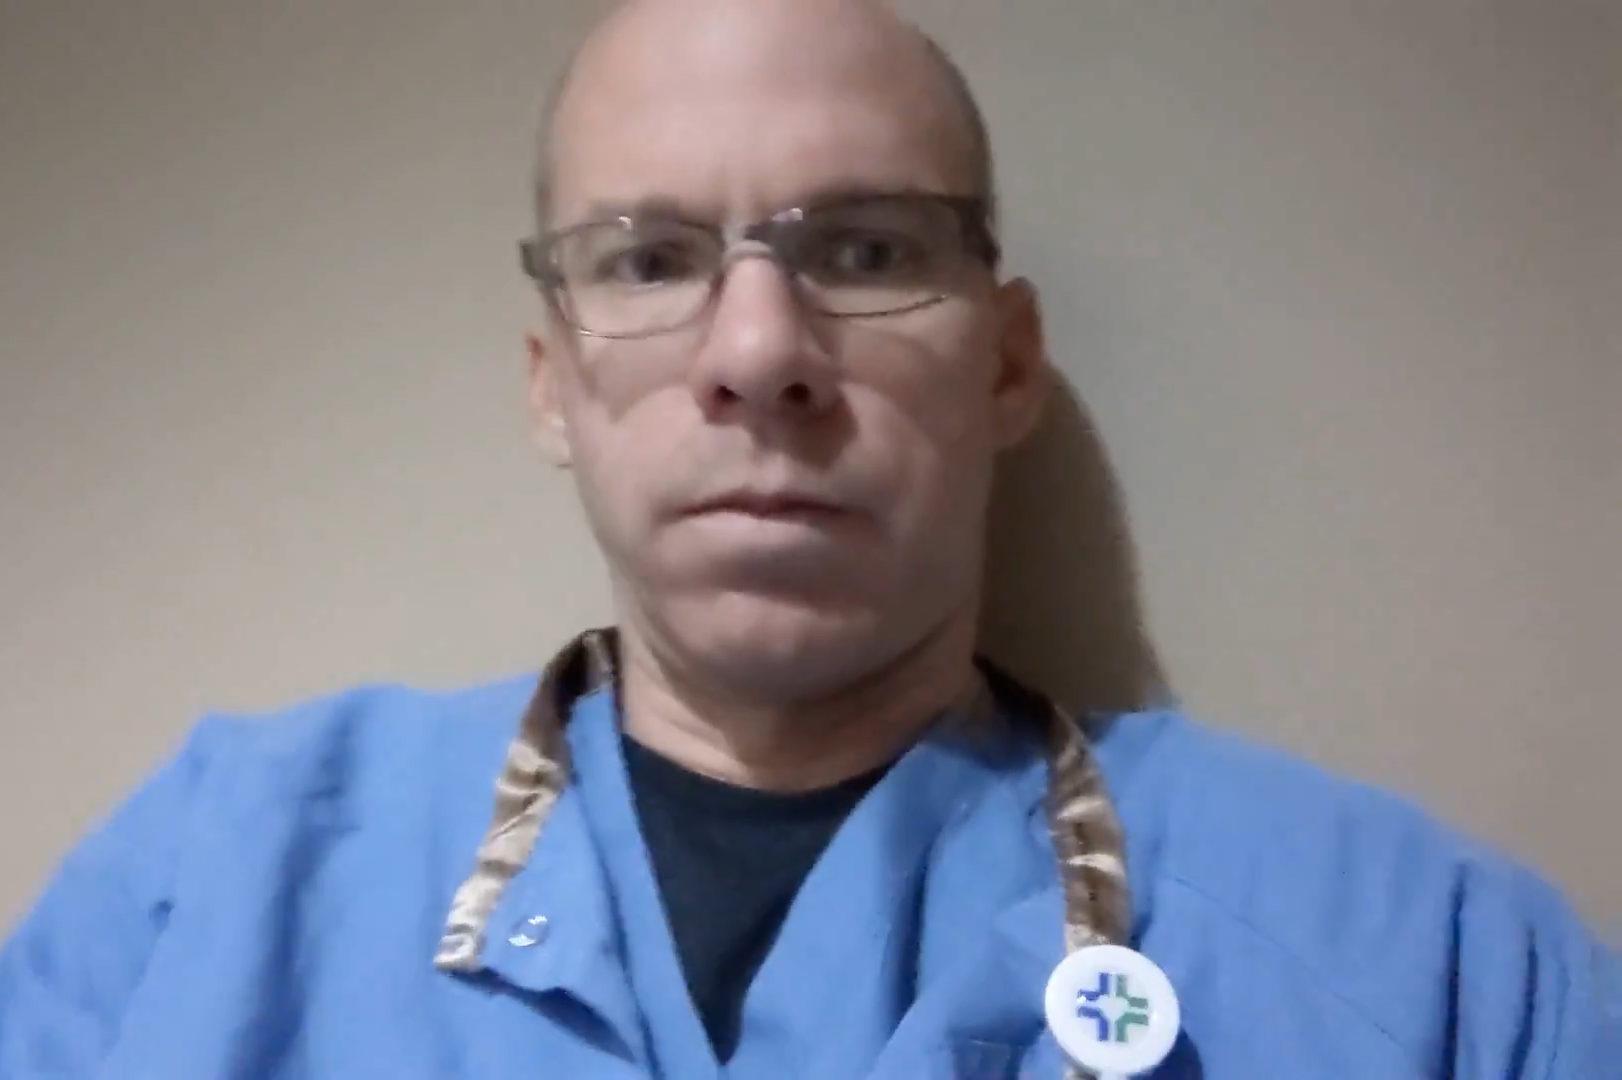 Dr. Peter Stubenrauch, Critical Care Pulmonologist, National Jewish